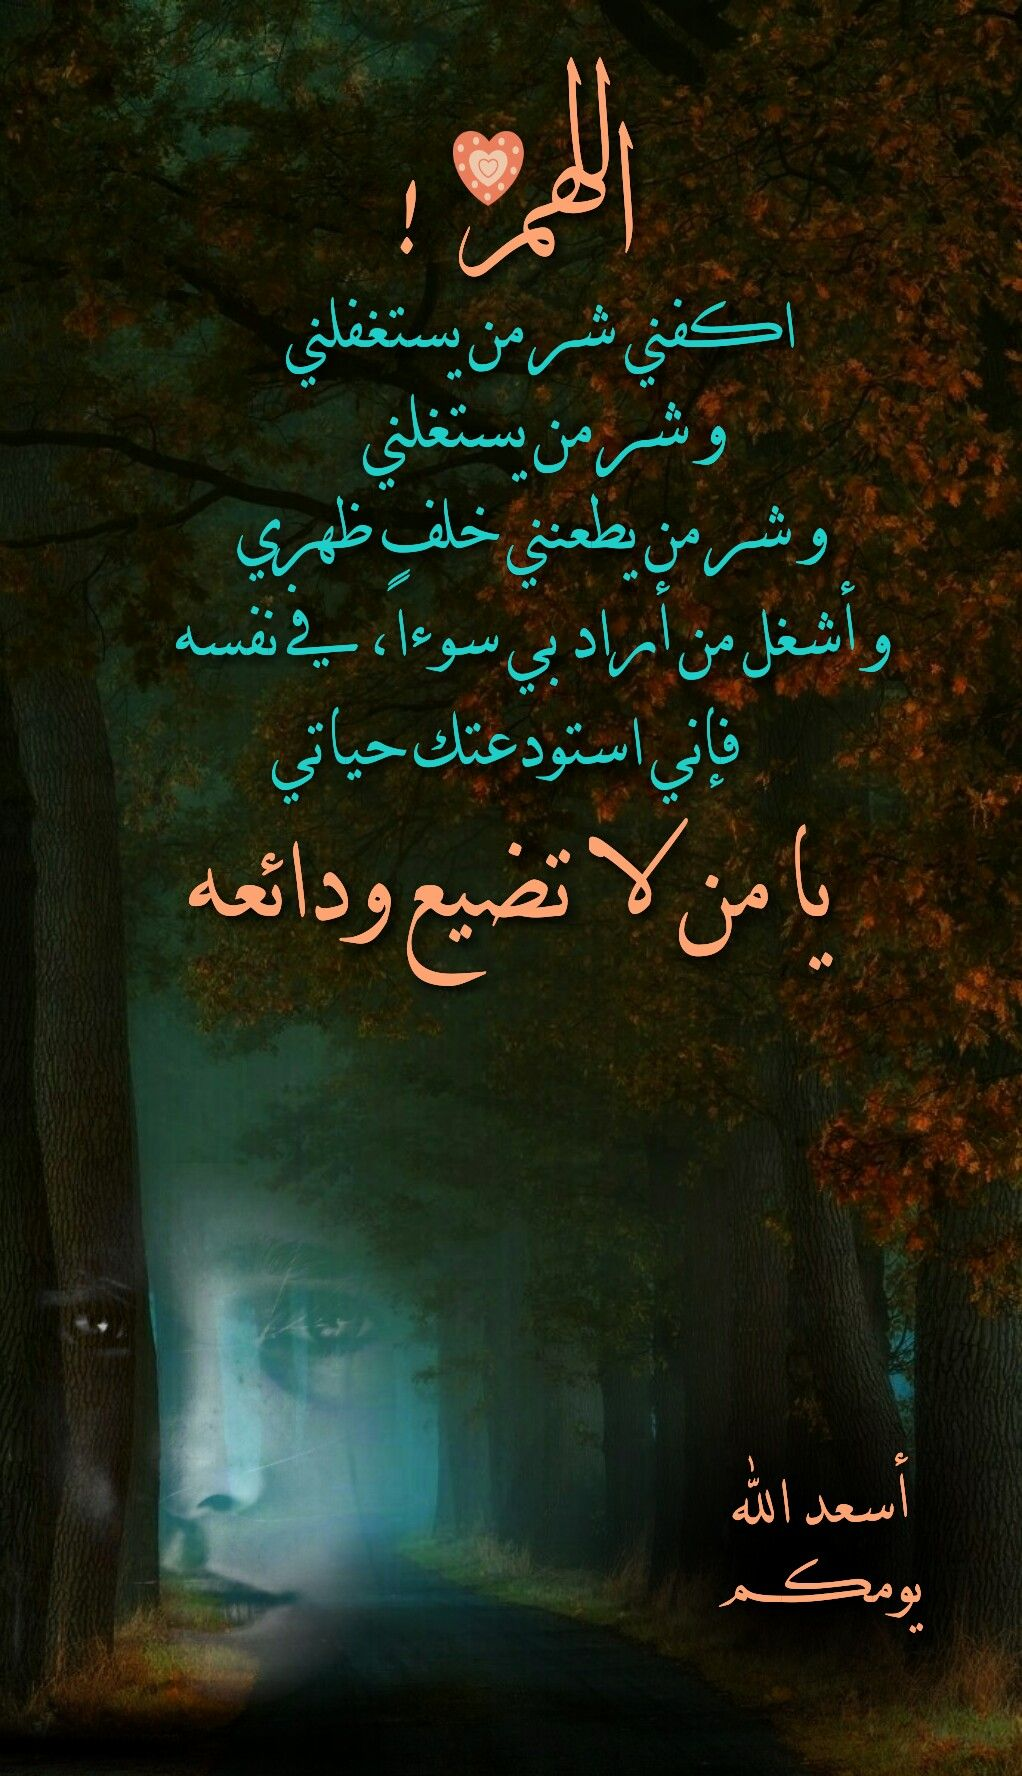 Pin By Ranya Anis On صباحيات و مسائيات Beautiful Morning Messages Morning Greeting Morning Messages